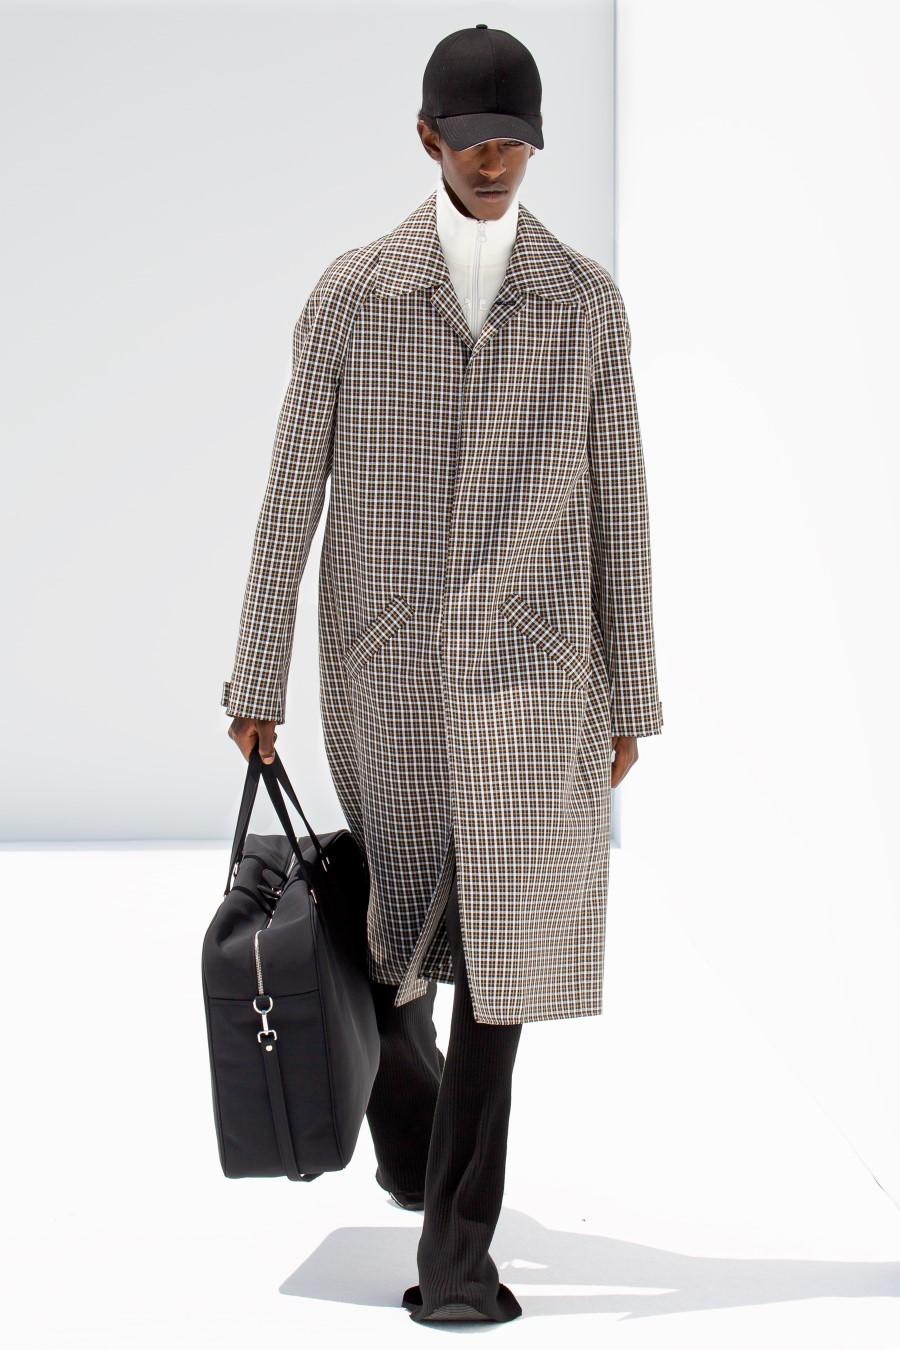 Courrèges Spring Summer 2022 - Paris Fashion Week Men's